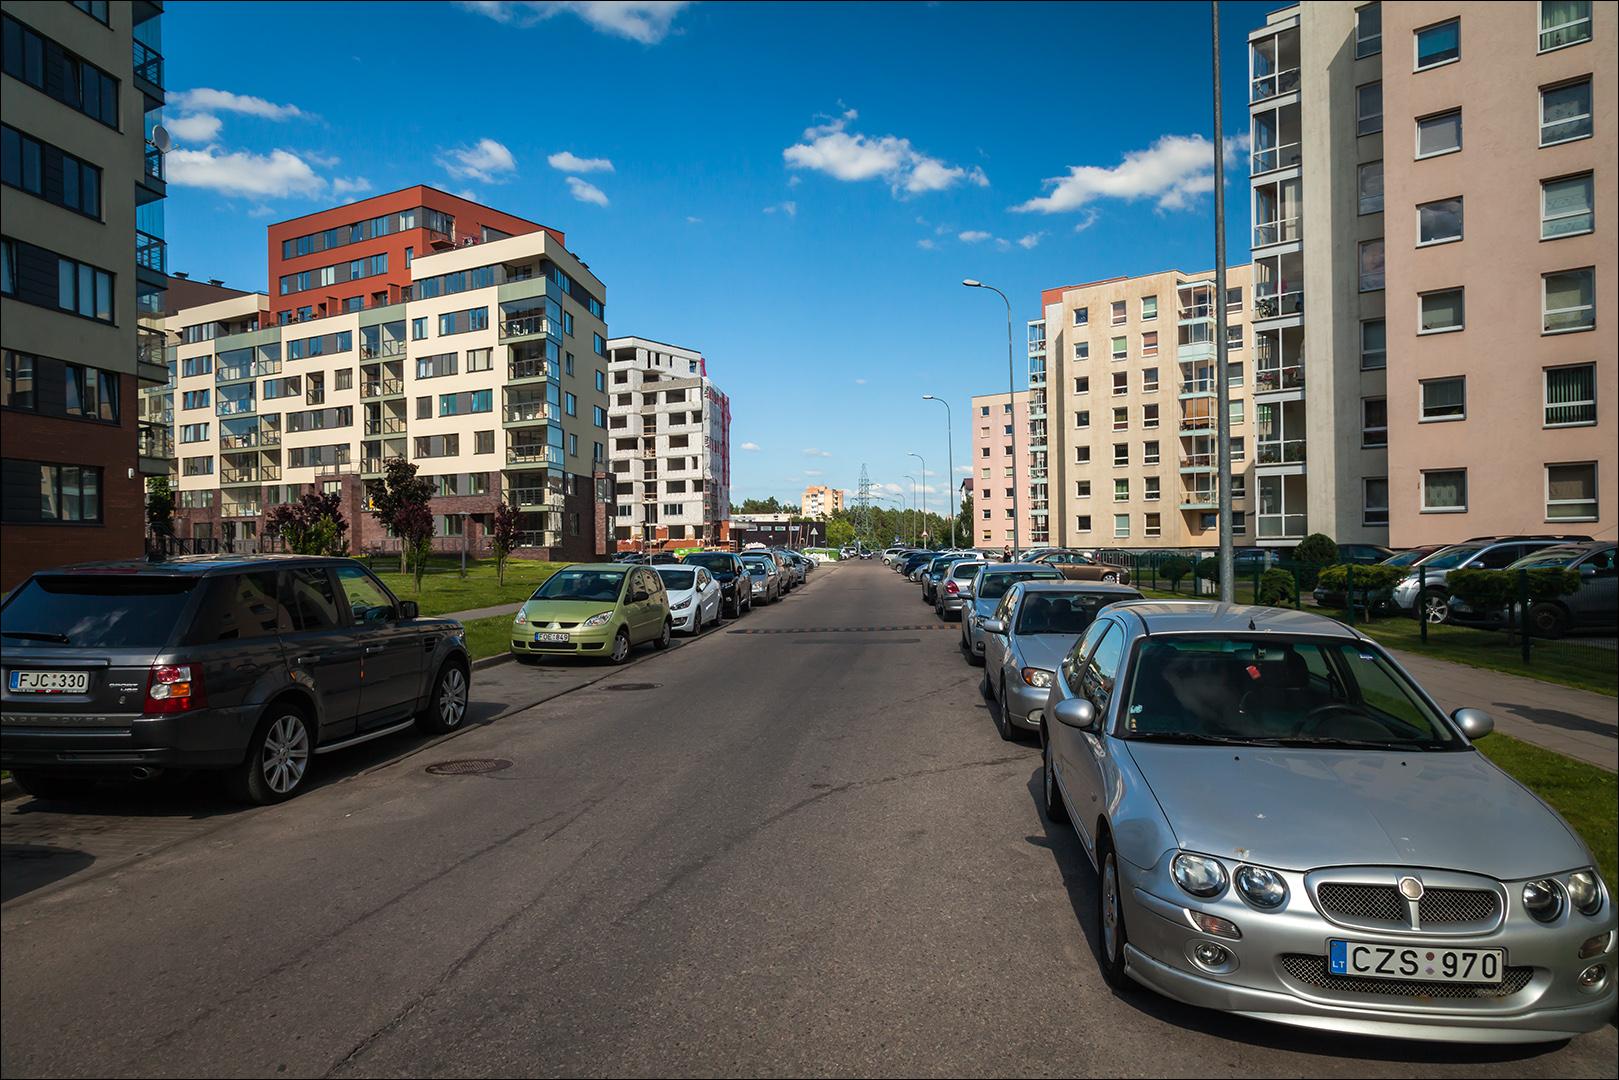 Photo: Лаздинай, один из районов Вильнюса